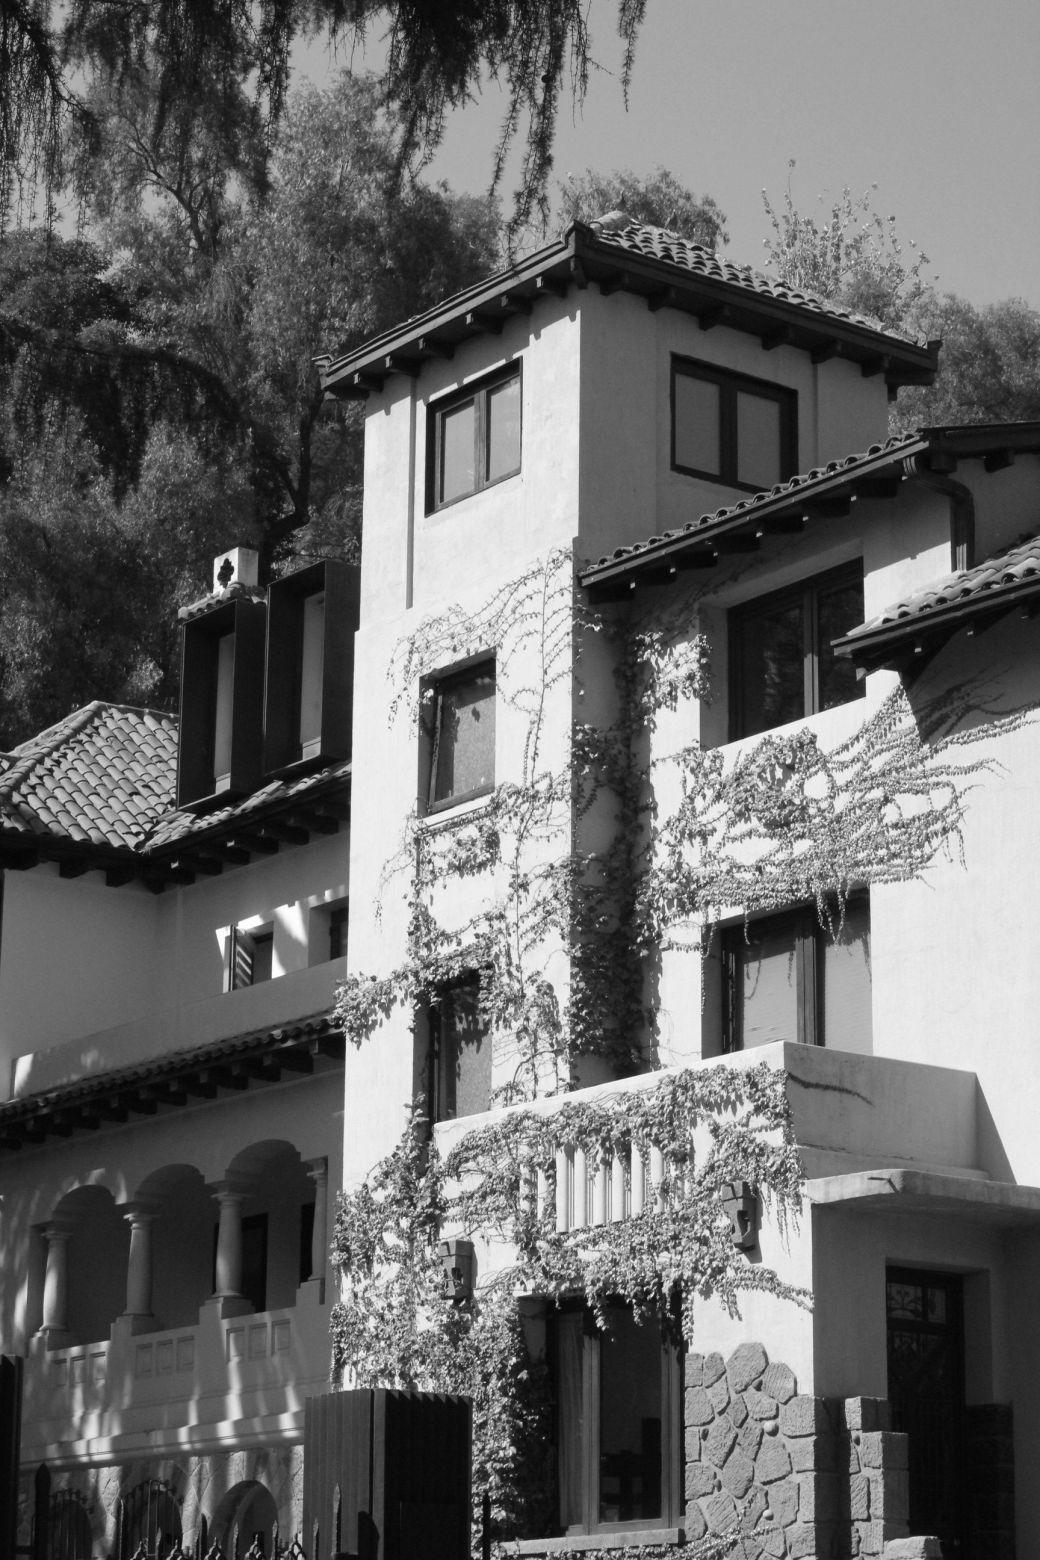 chile santiago pablo neruda house neighborhood 2